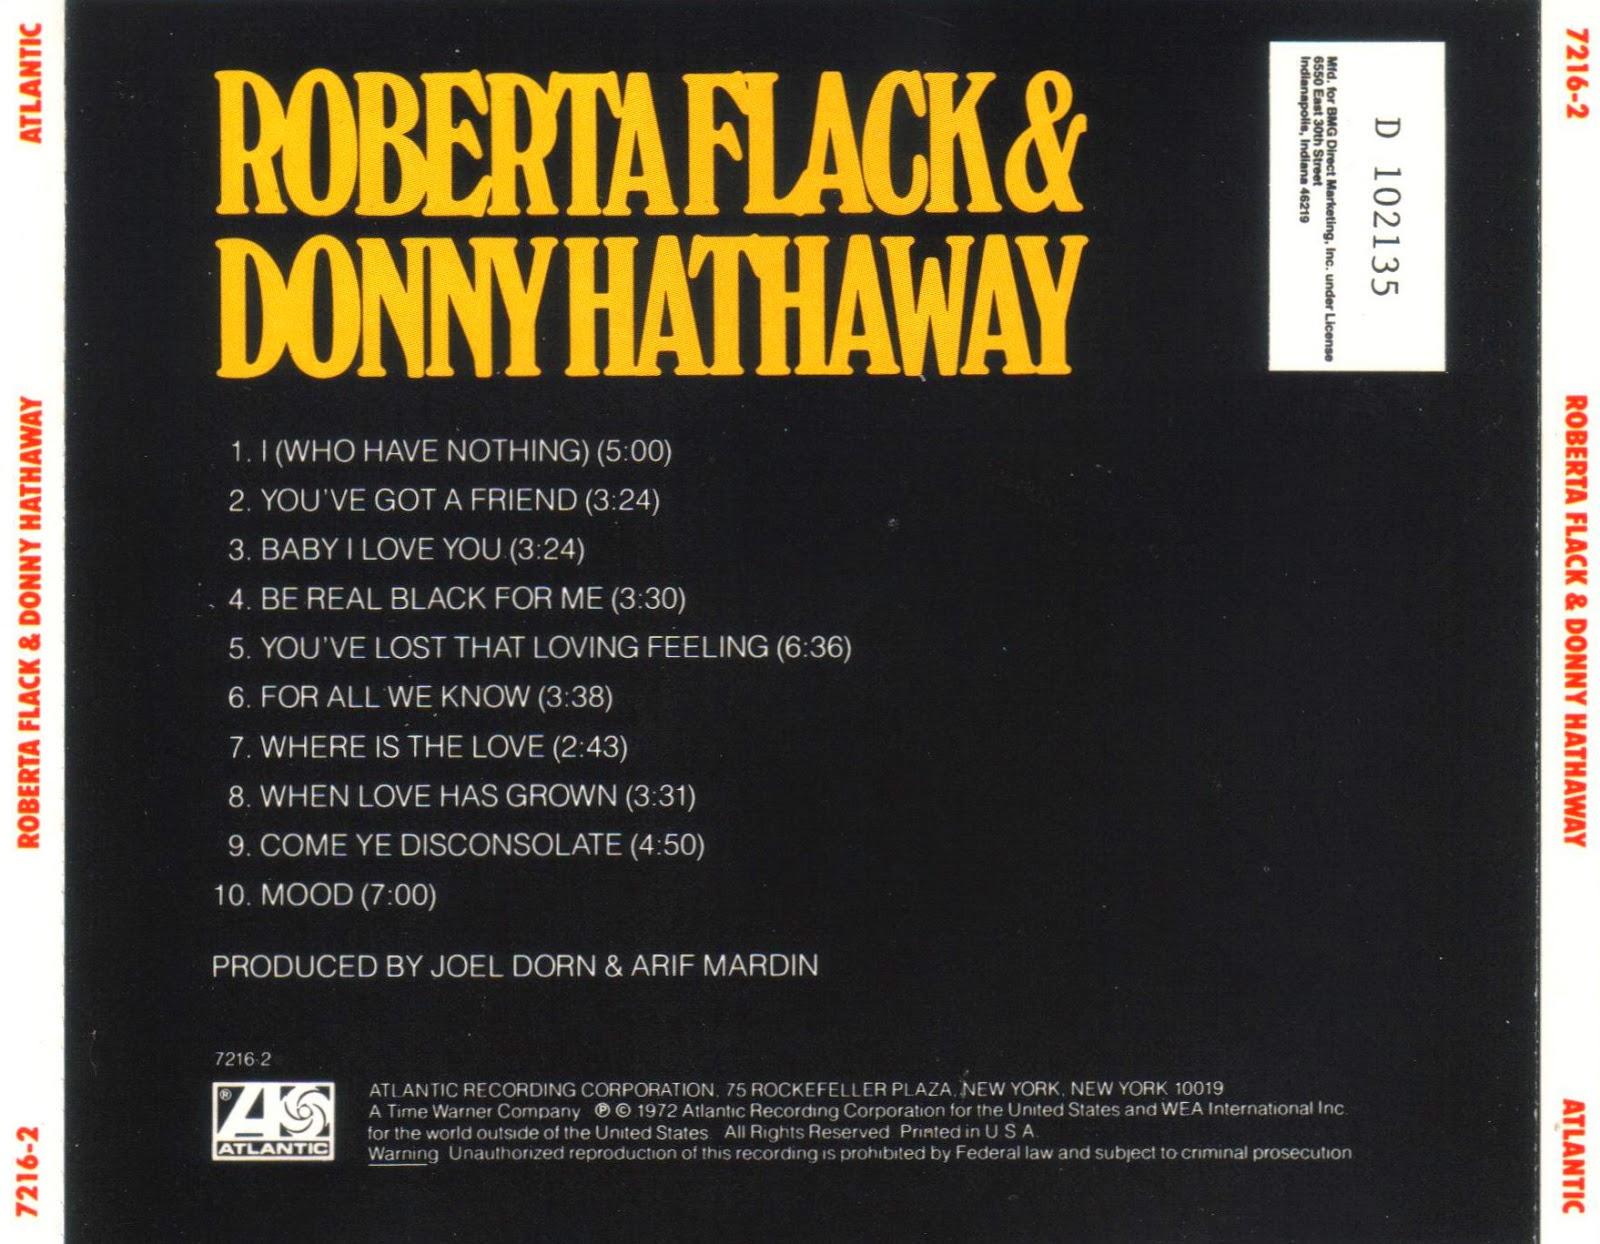 Roberta Flack  Donny Hathaway Roberta Flack Donny Hathaway